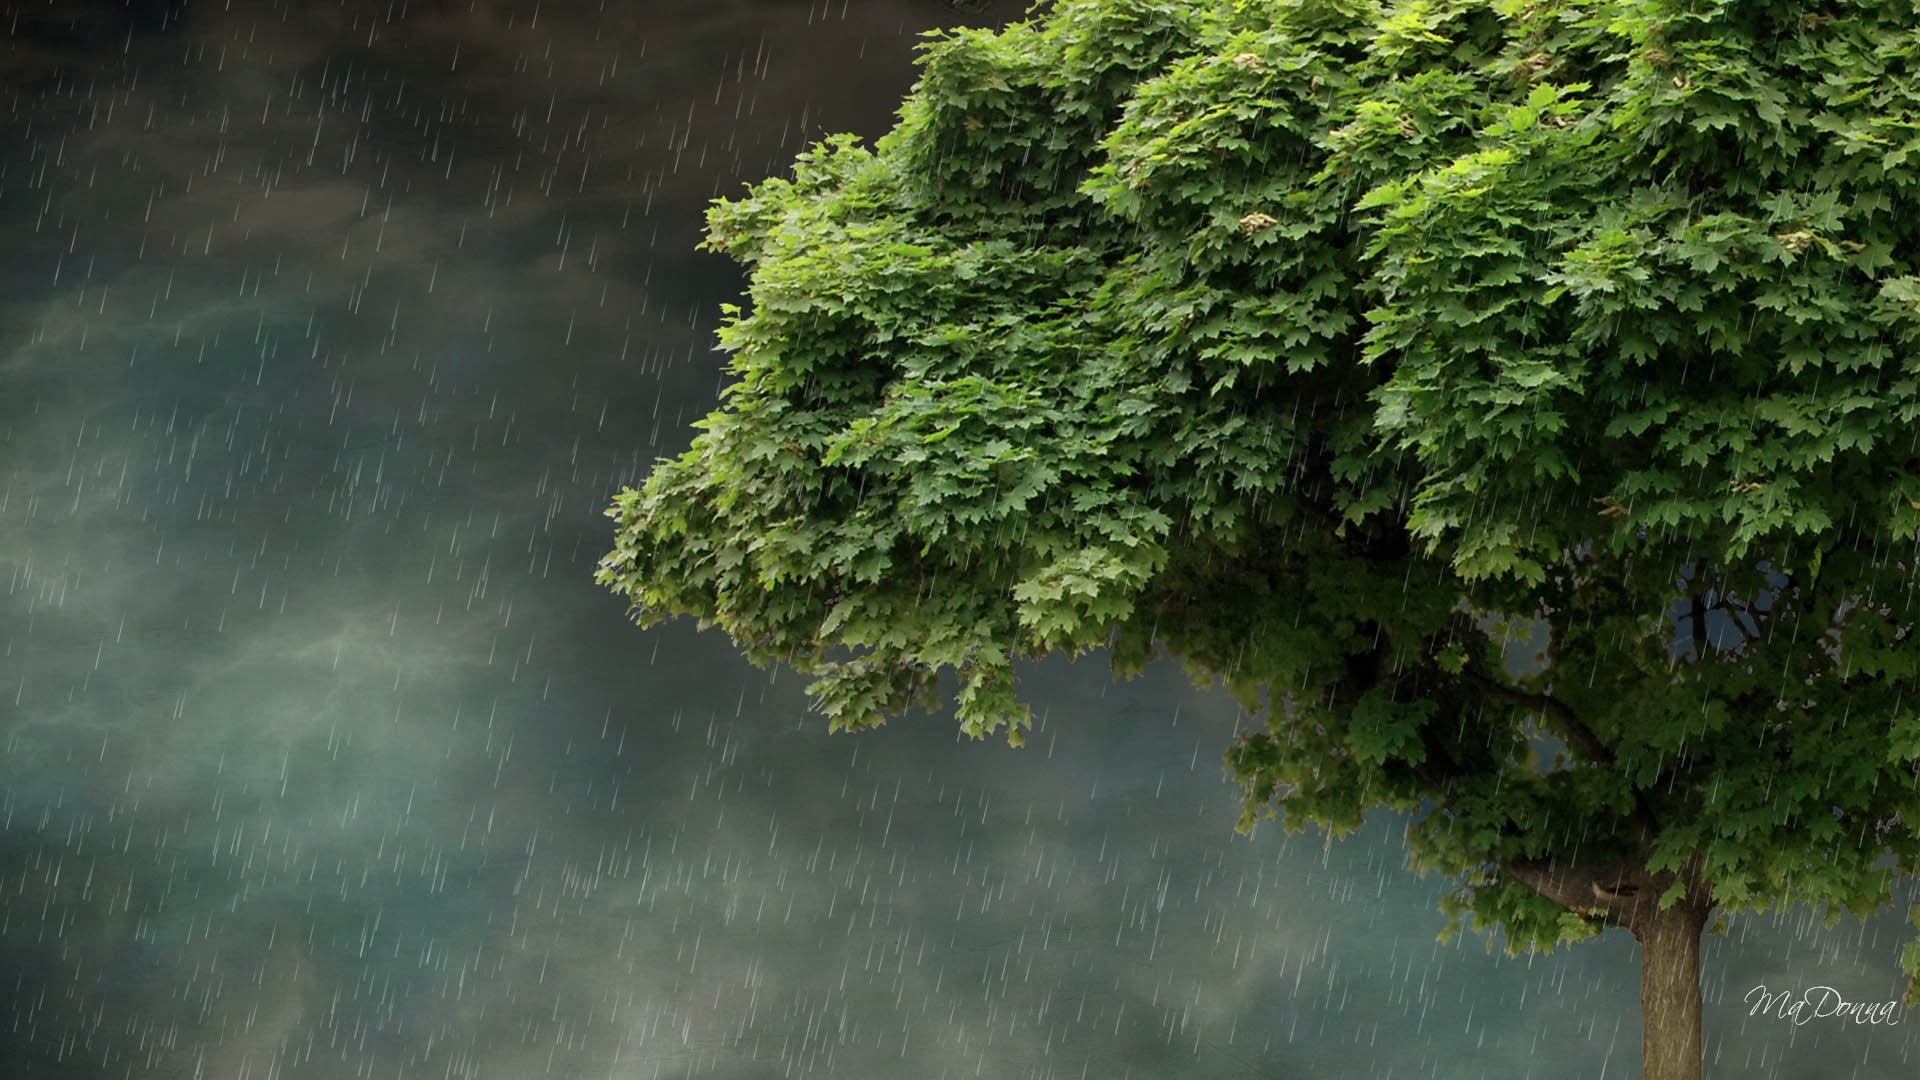 Full Screen Desktop Fall Leaves Wallpaper Beautiful Rainy Landscapes Wallpapers Hd 2018 183 ①